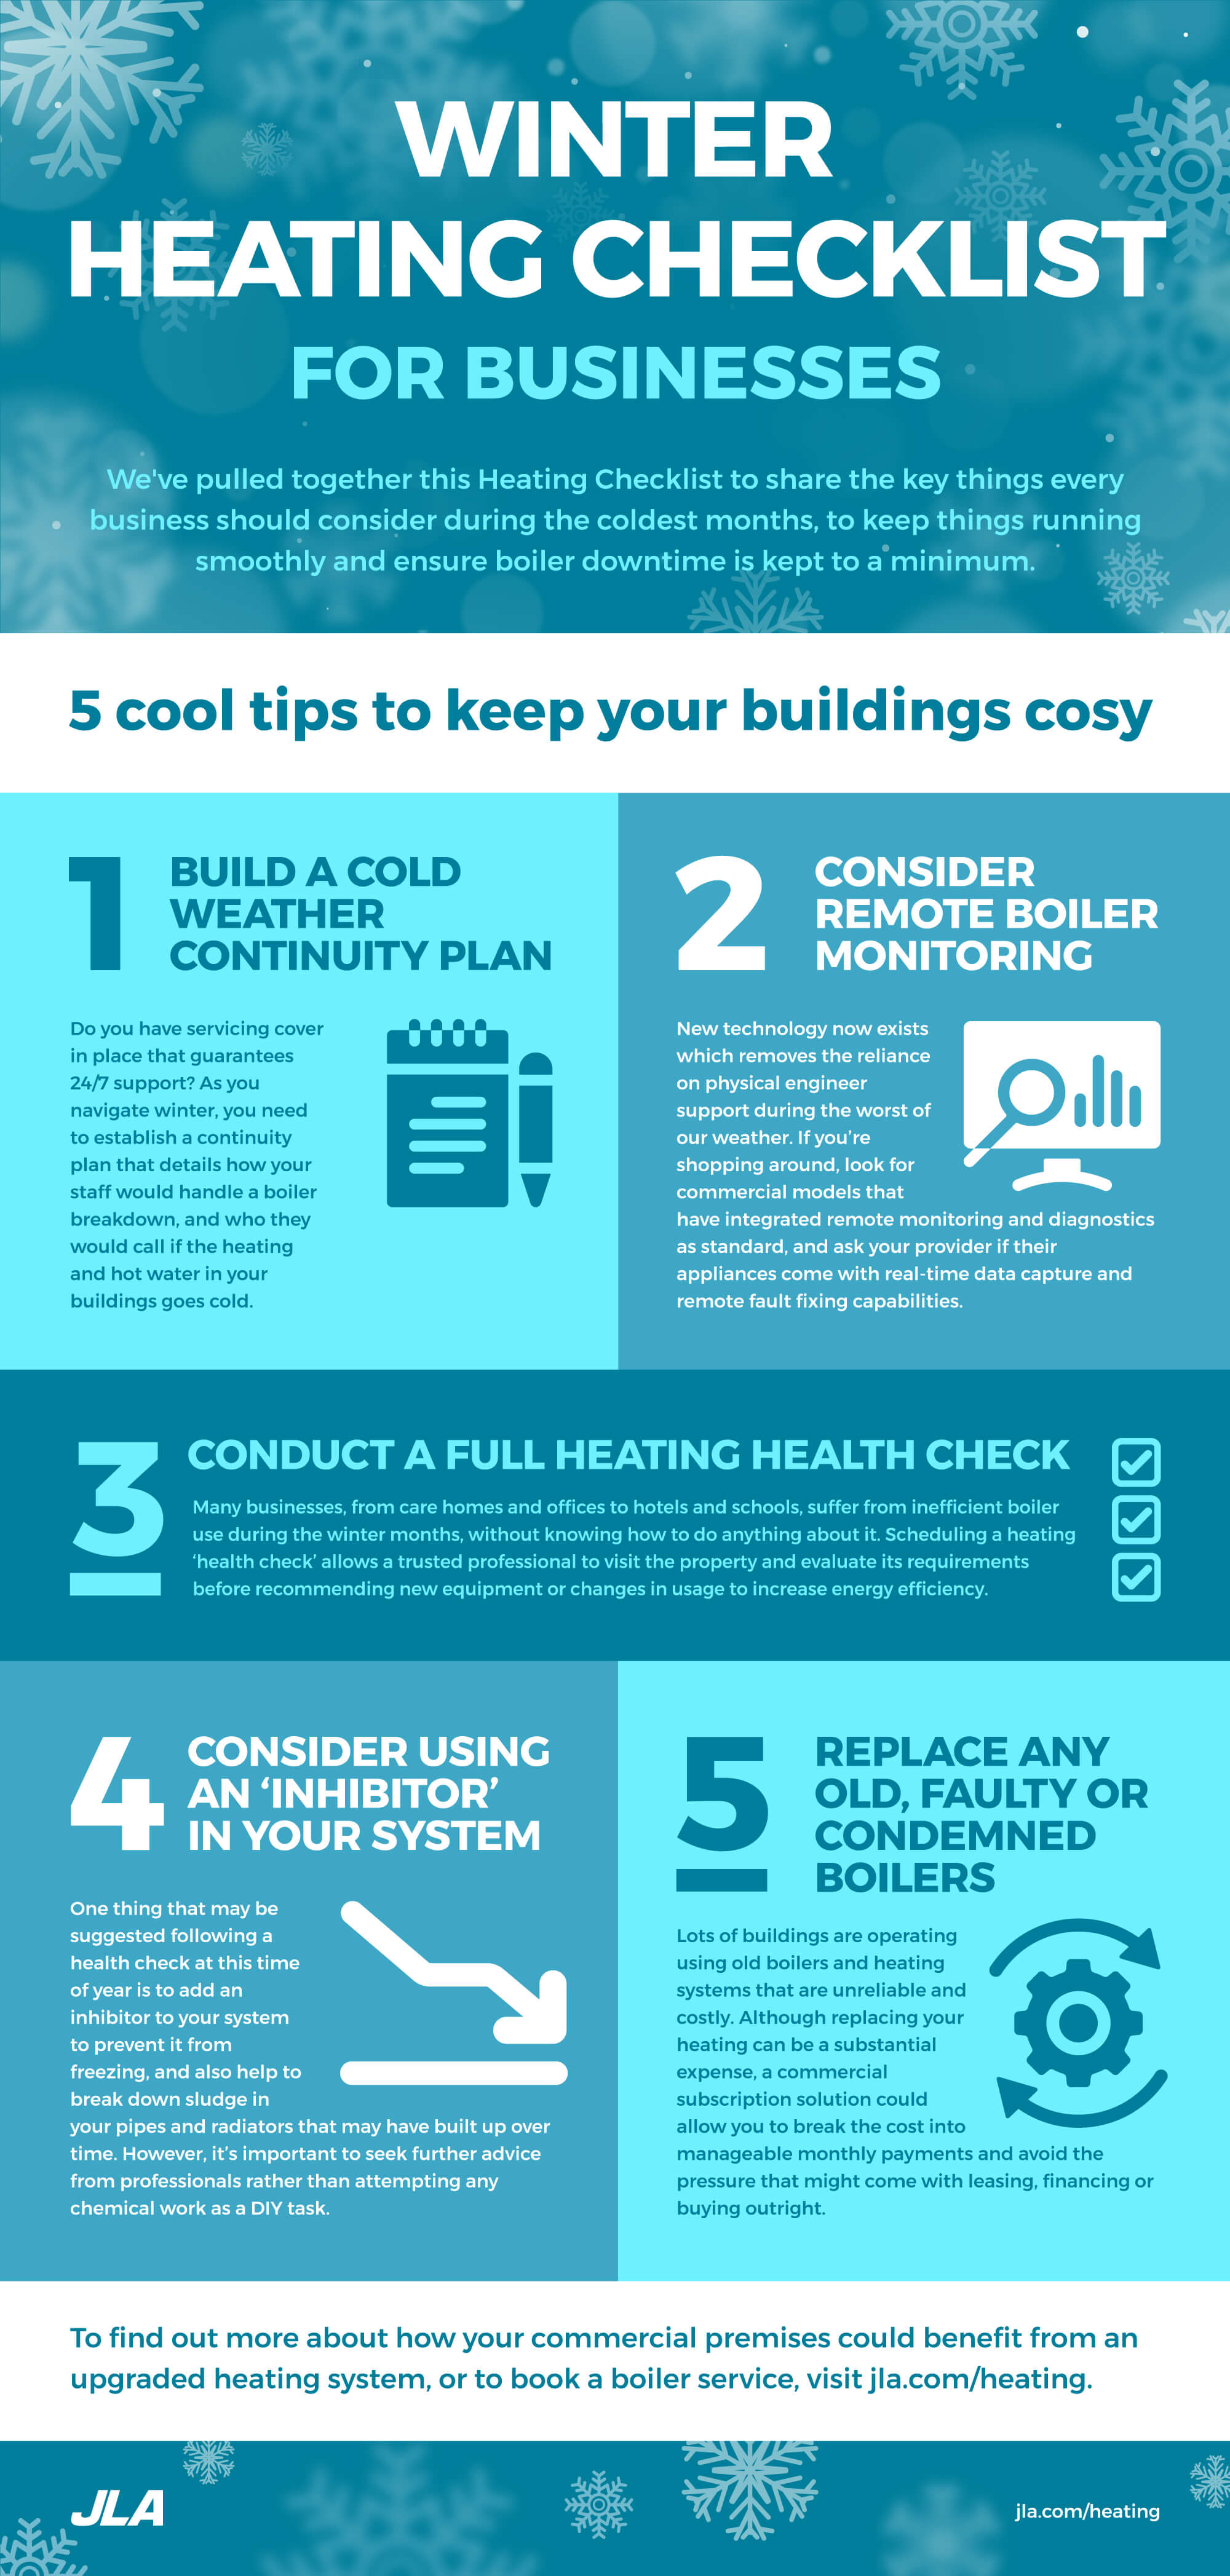 Winter heating checklist from JLA